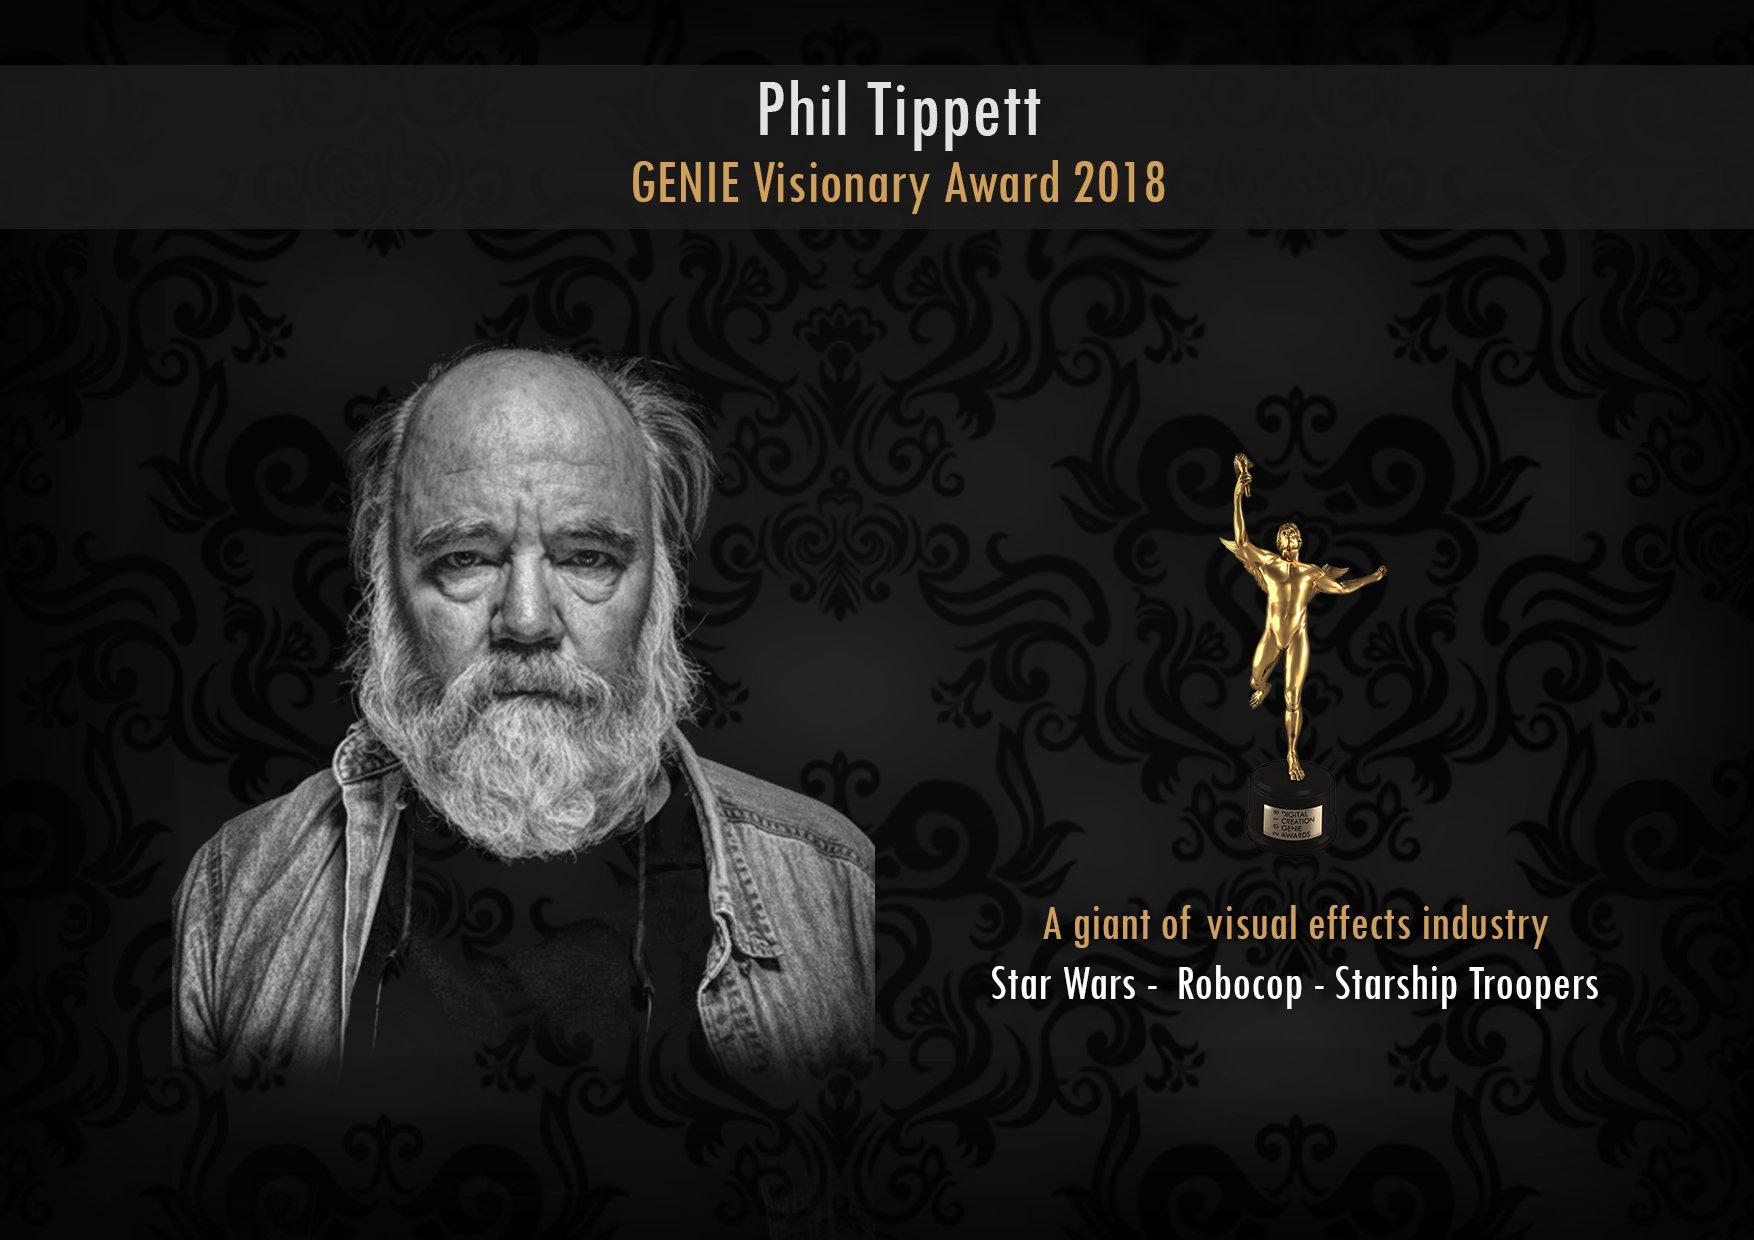 Phil Tippett